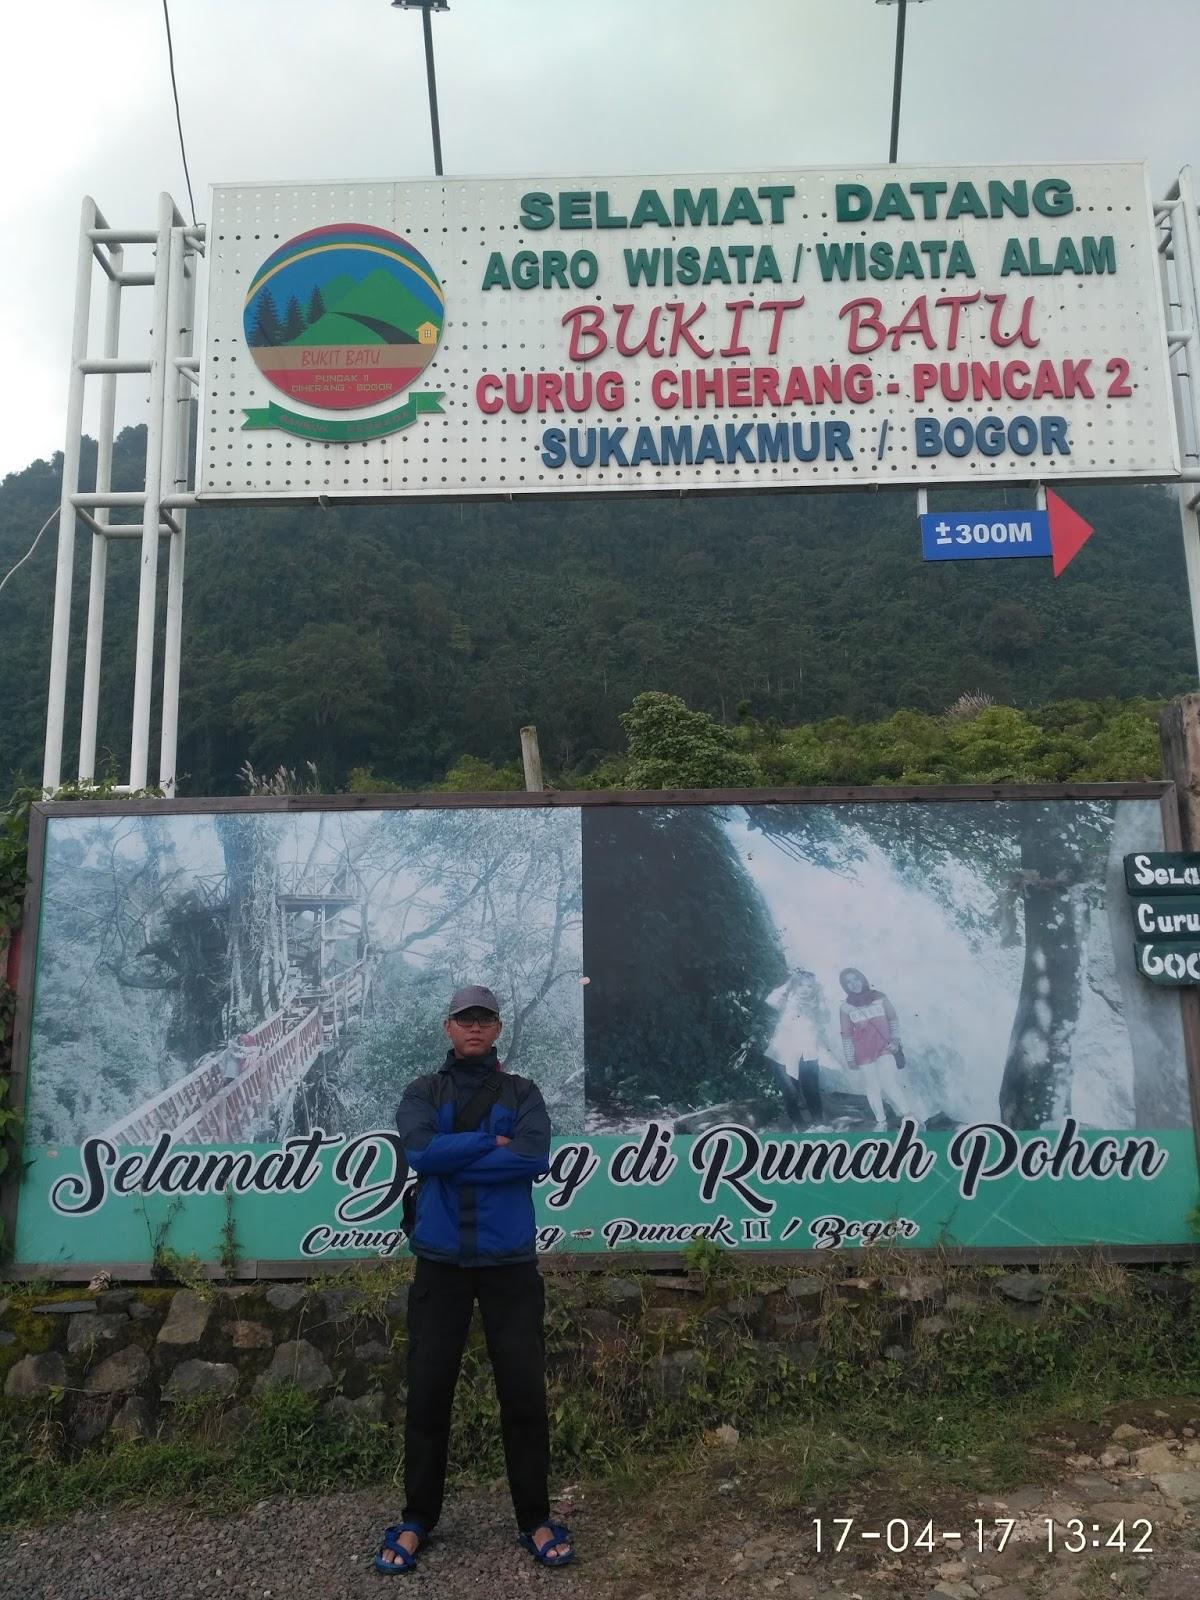 Obyek Wisata Yang Wajib Dikunjungi Air Terjun Curug Ciherang